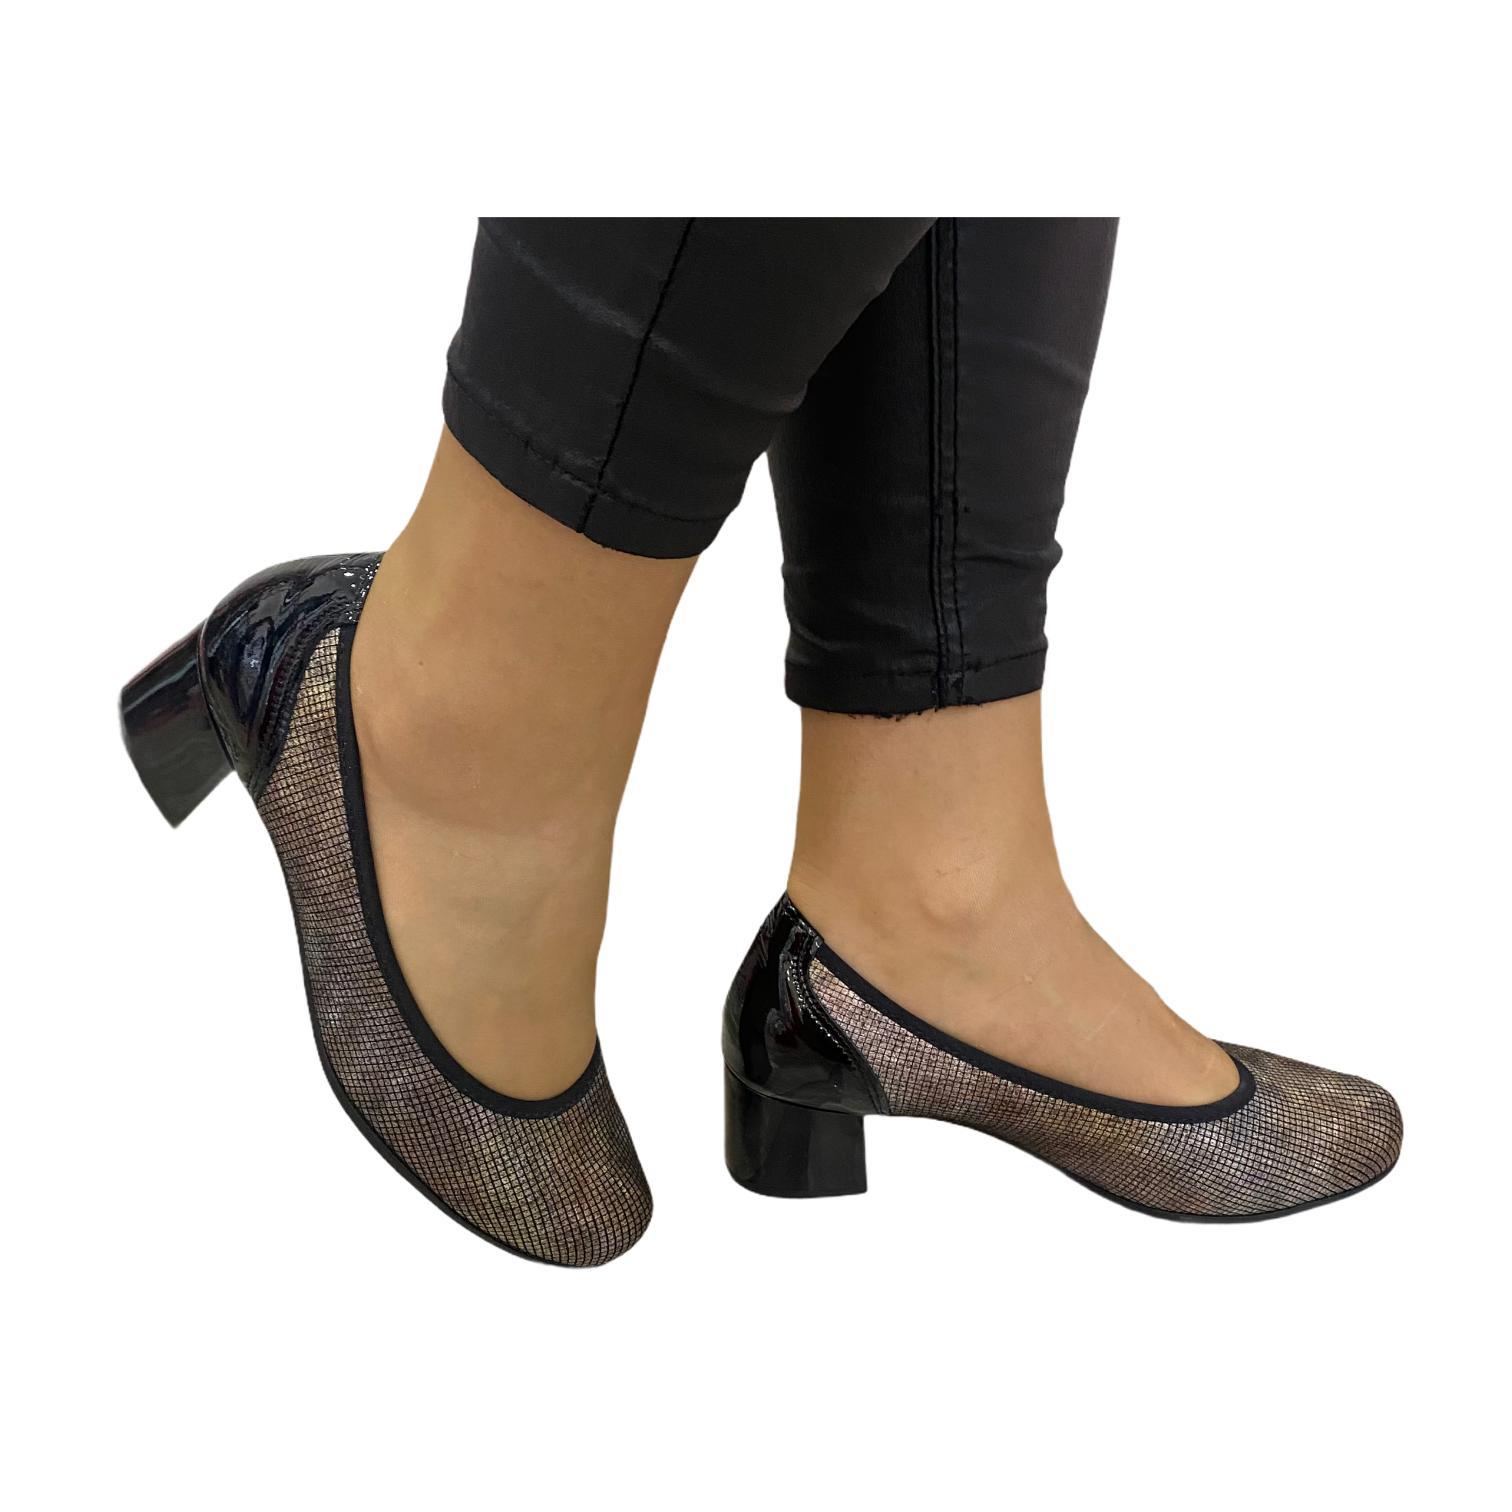 Pantofi Pitillos negri cu model in relief